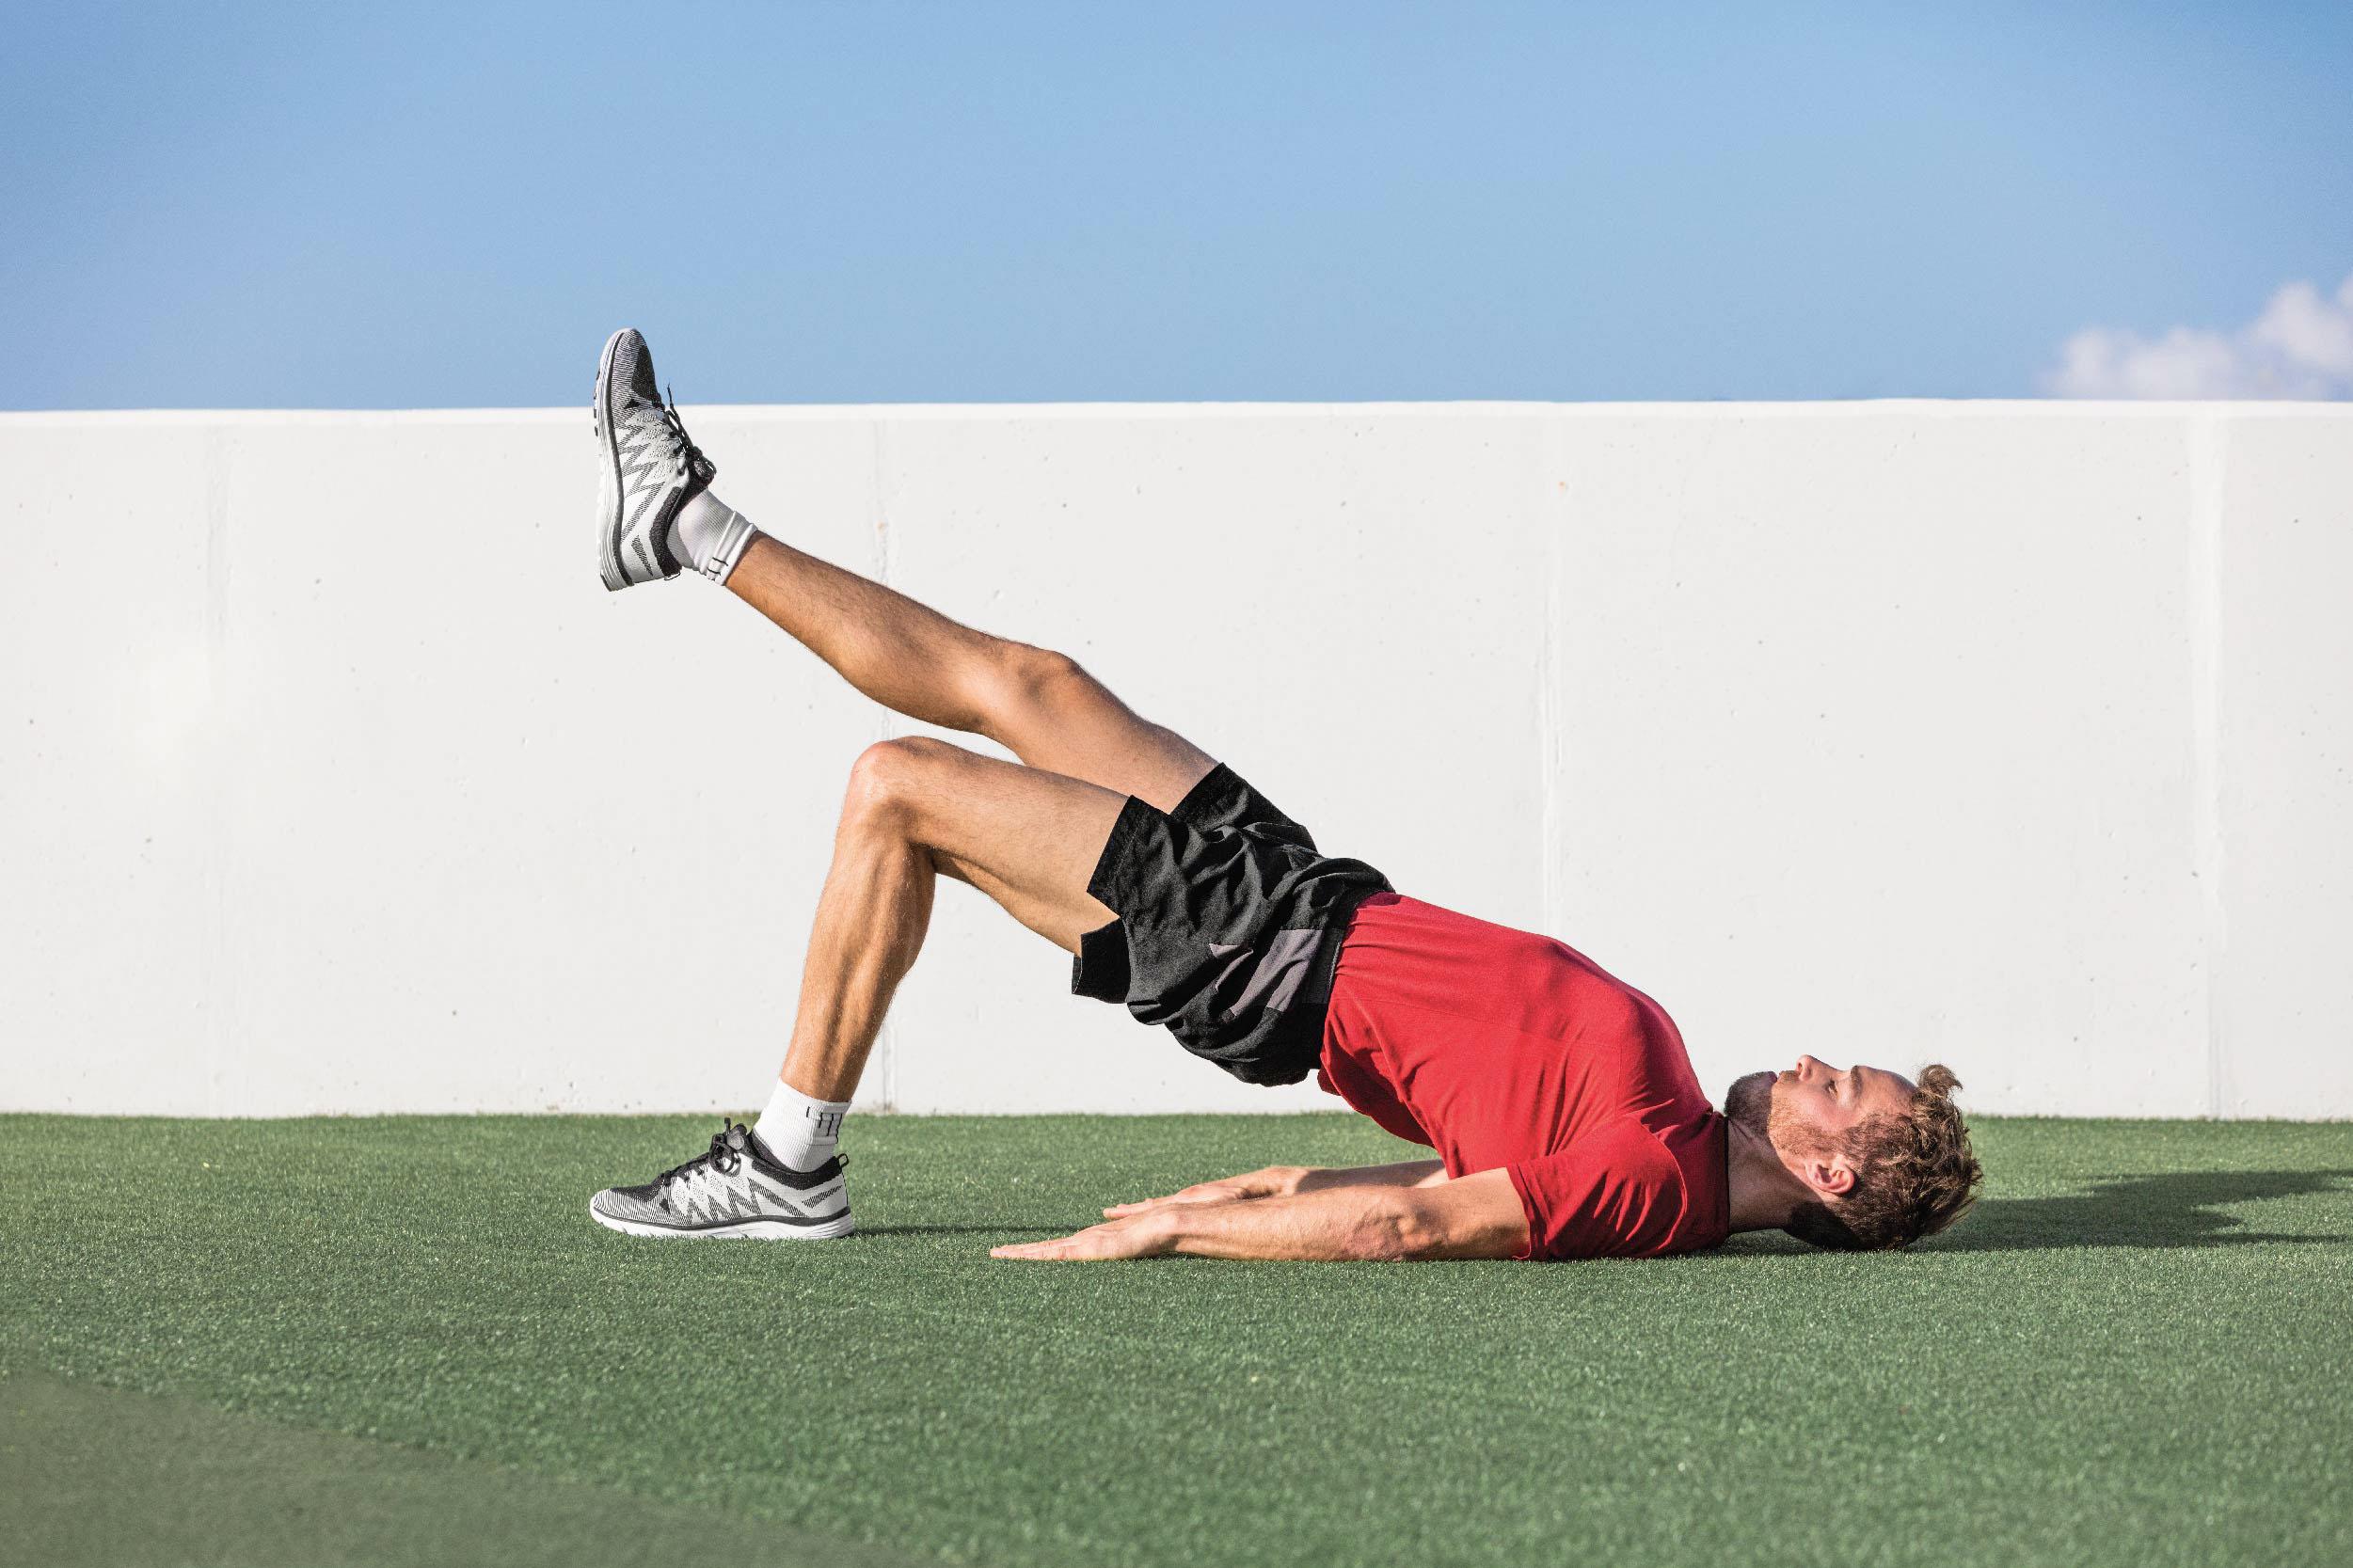 How to improve leg strength for running